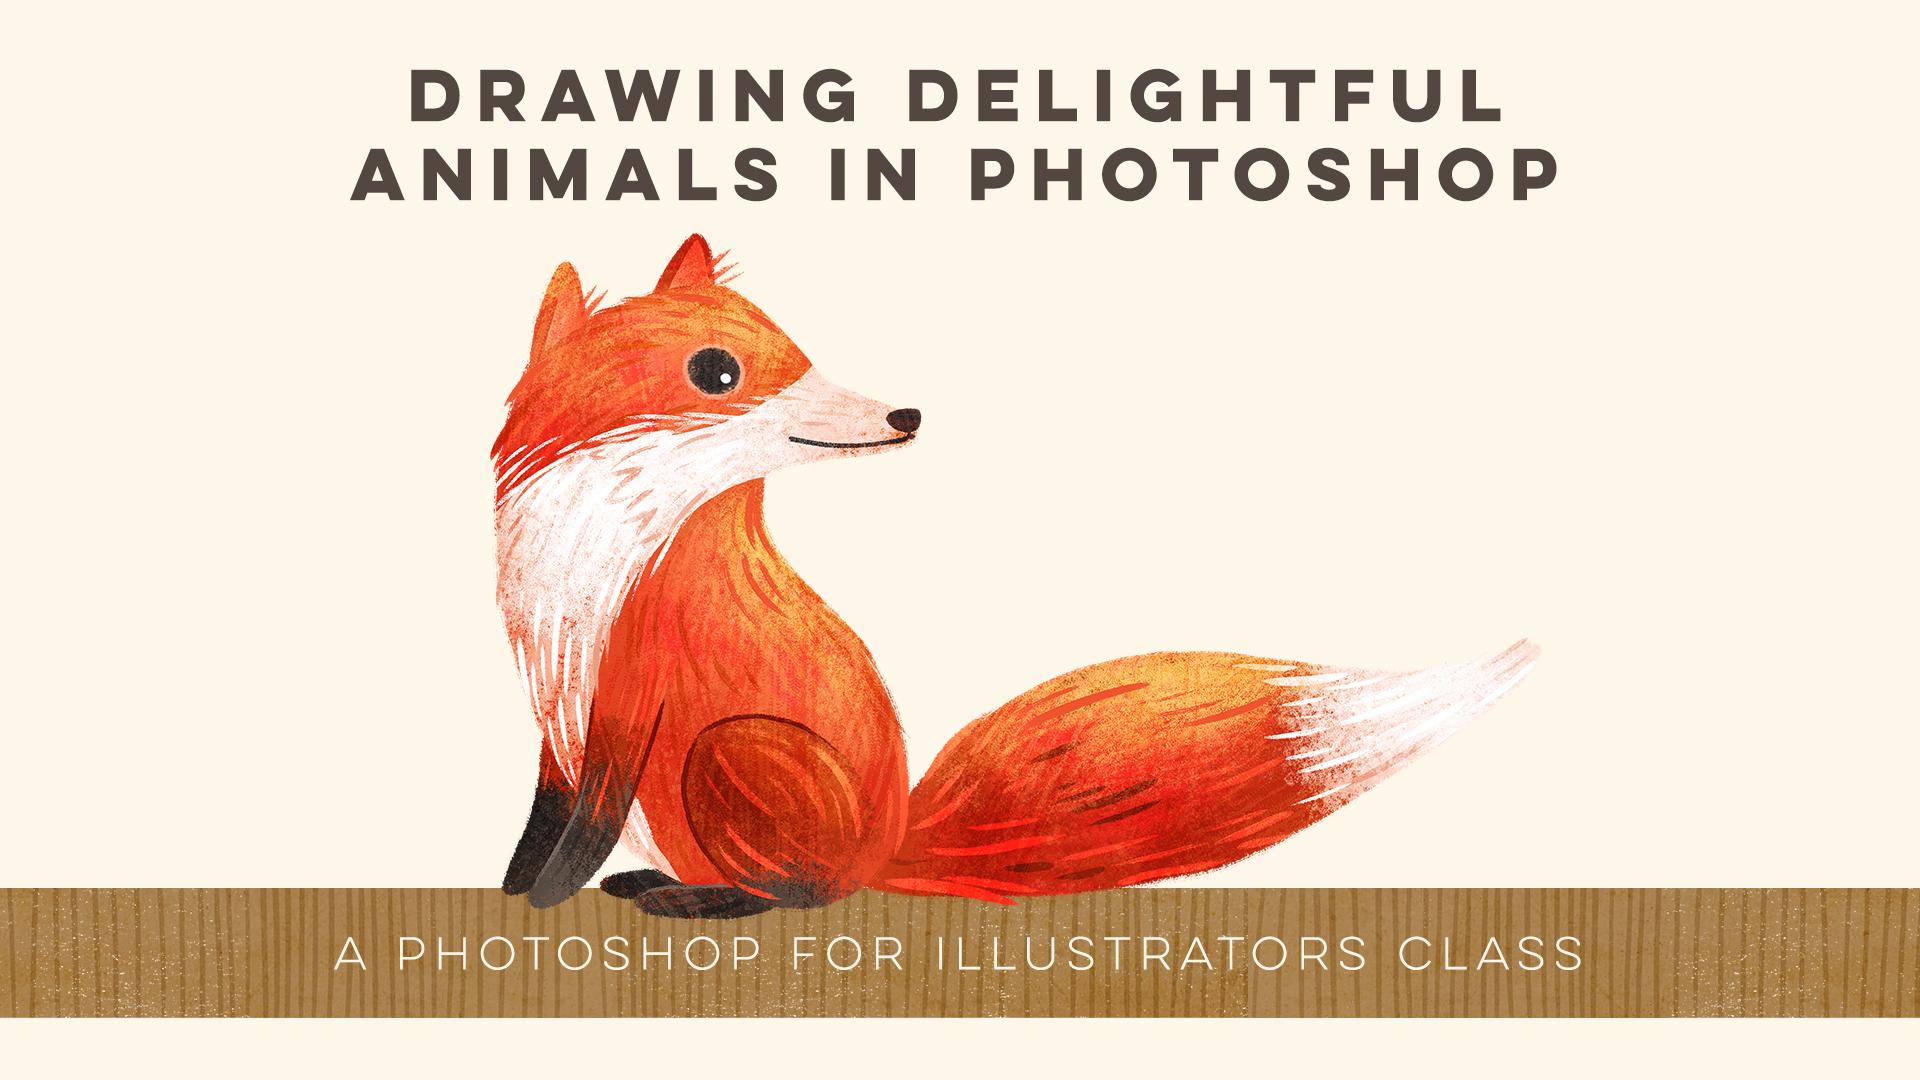 drawing delightful animals_promo image.jpg